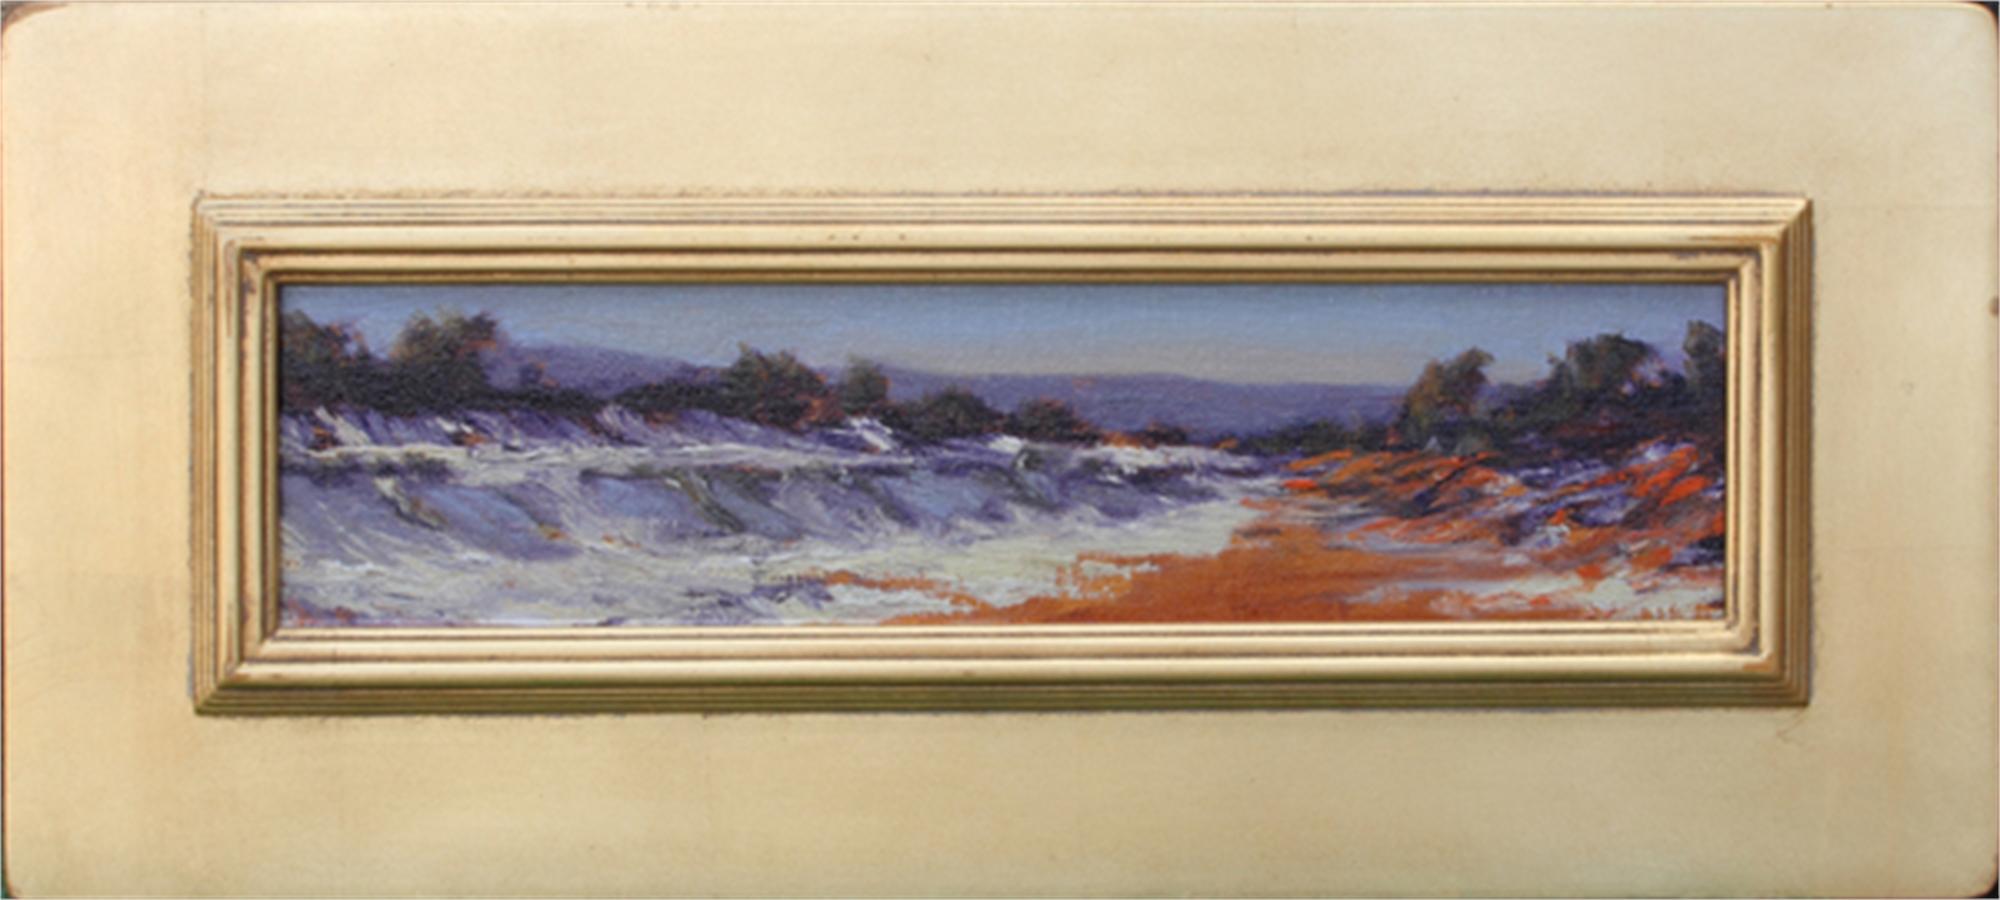 Winter Arroyo by William Berra